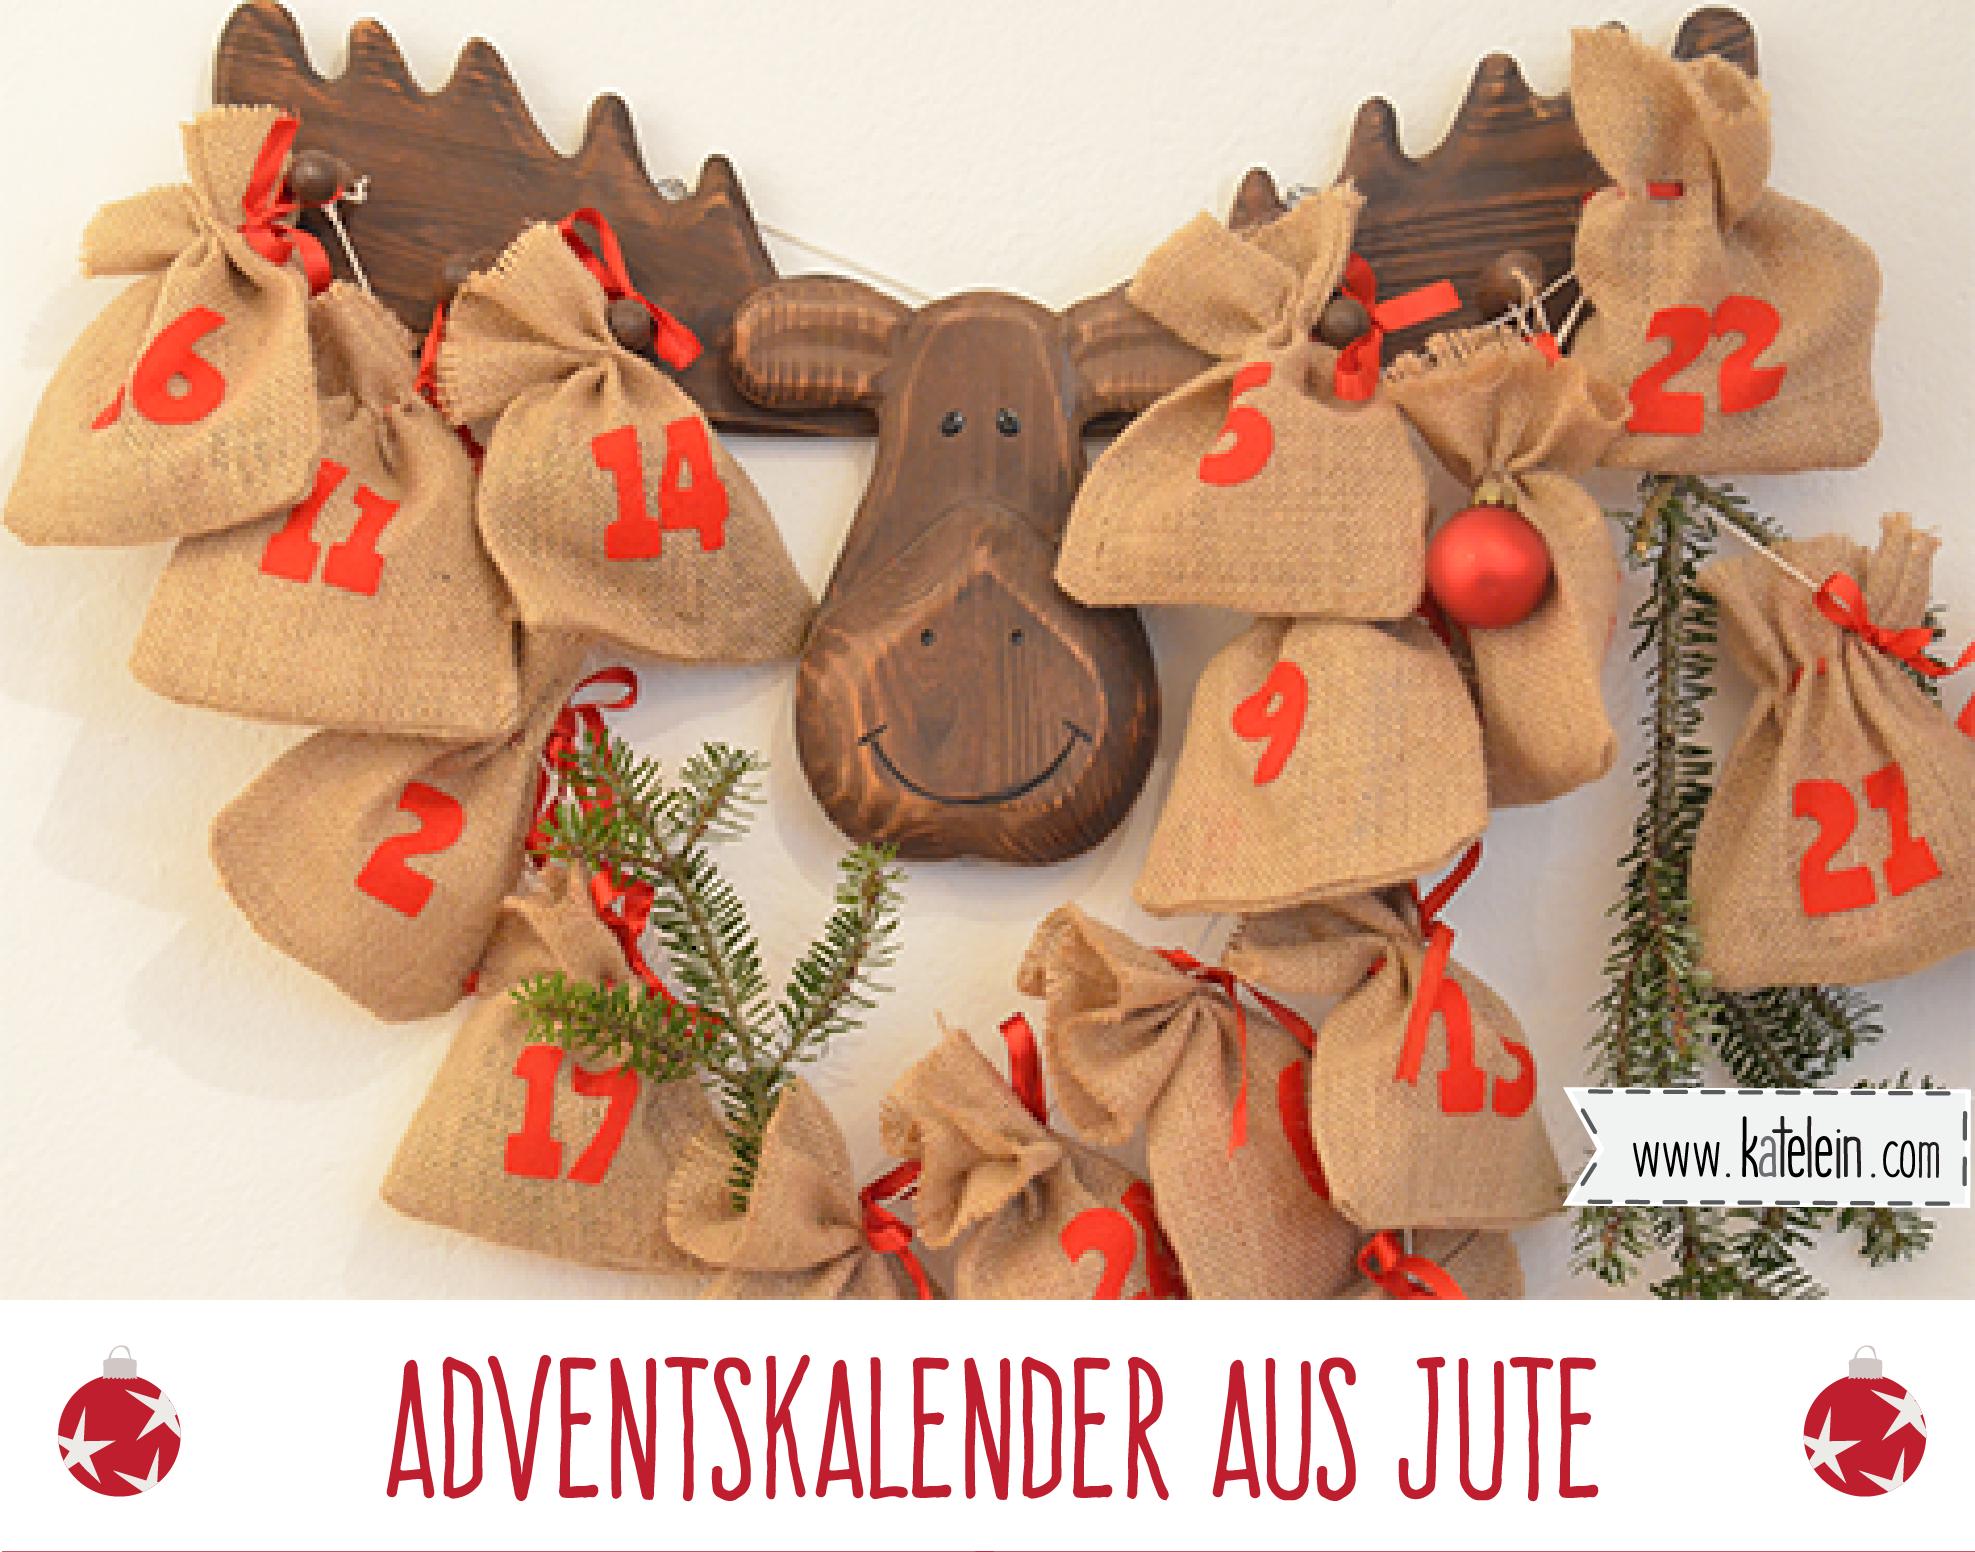 adventskalender_anleitung-07